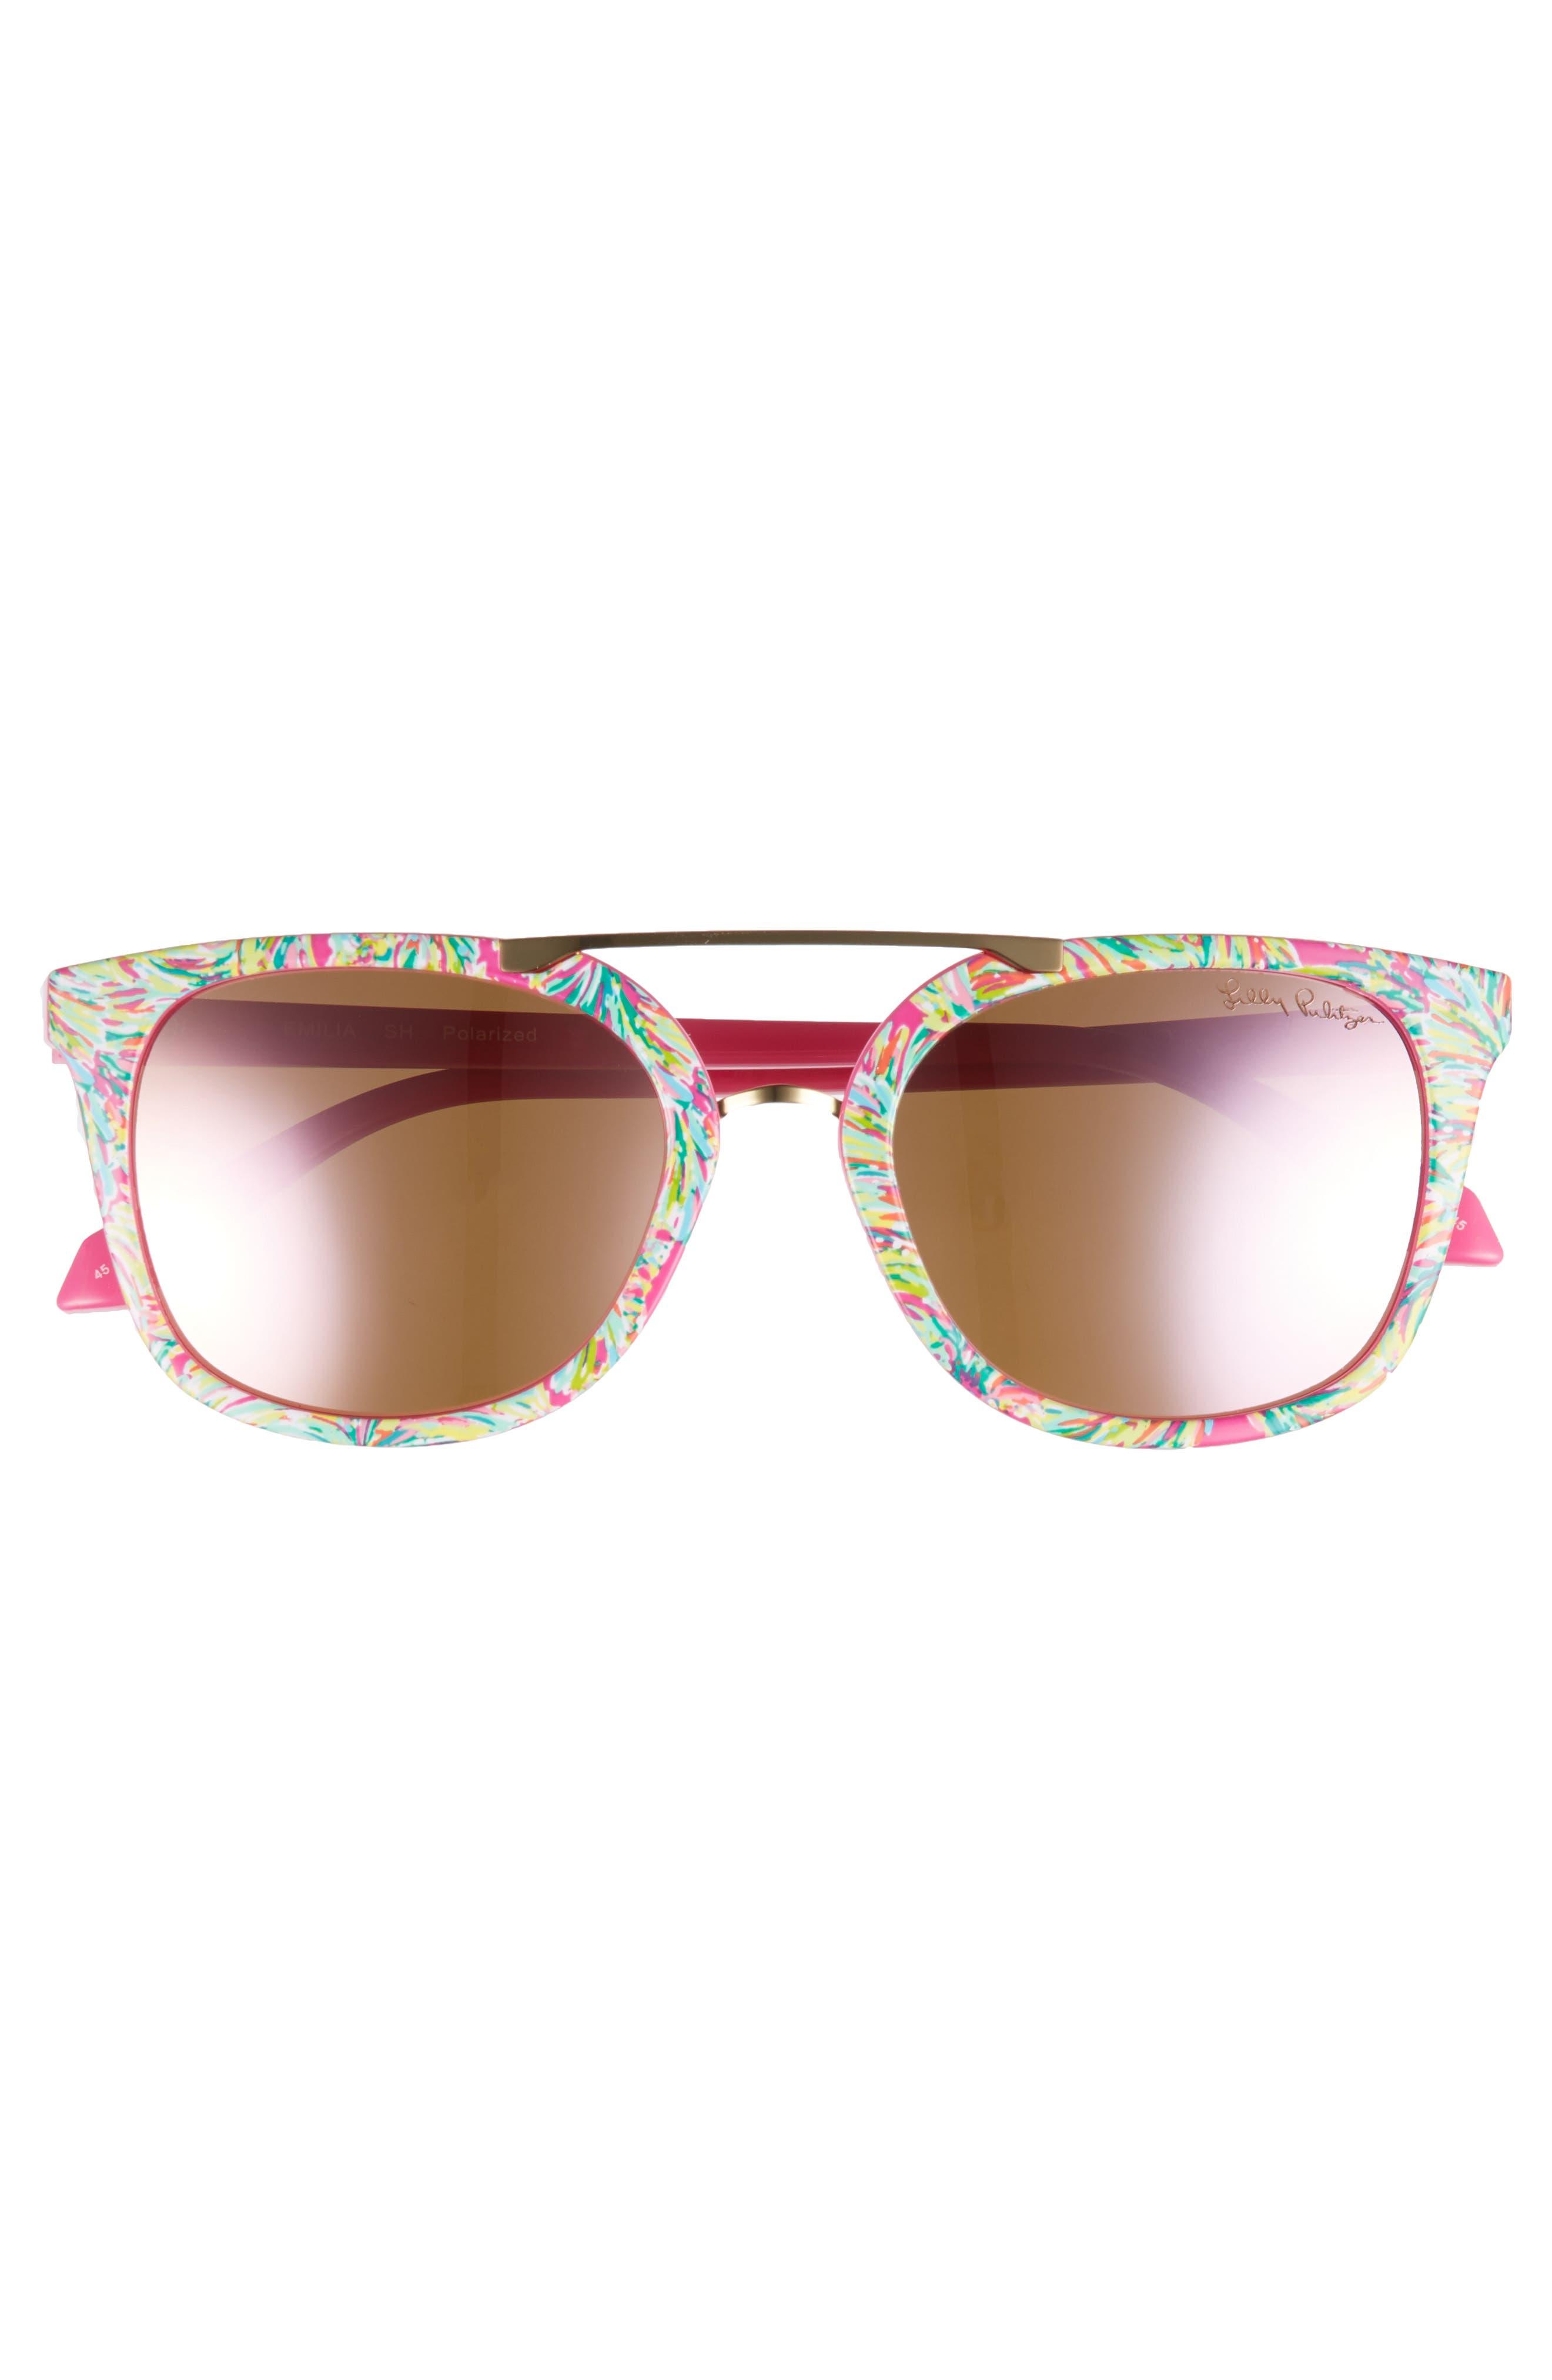 Lilly Pulitzer Emilia 53mm Polarized Sunglasses,                             Alternate thumbnail 3, color,                             Shady Lady/ Pink